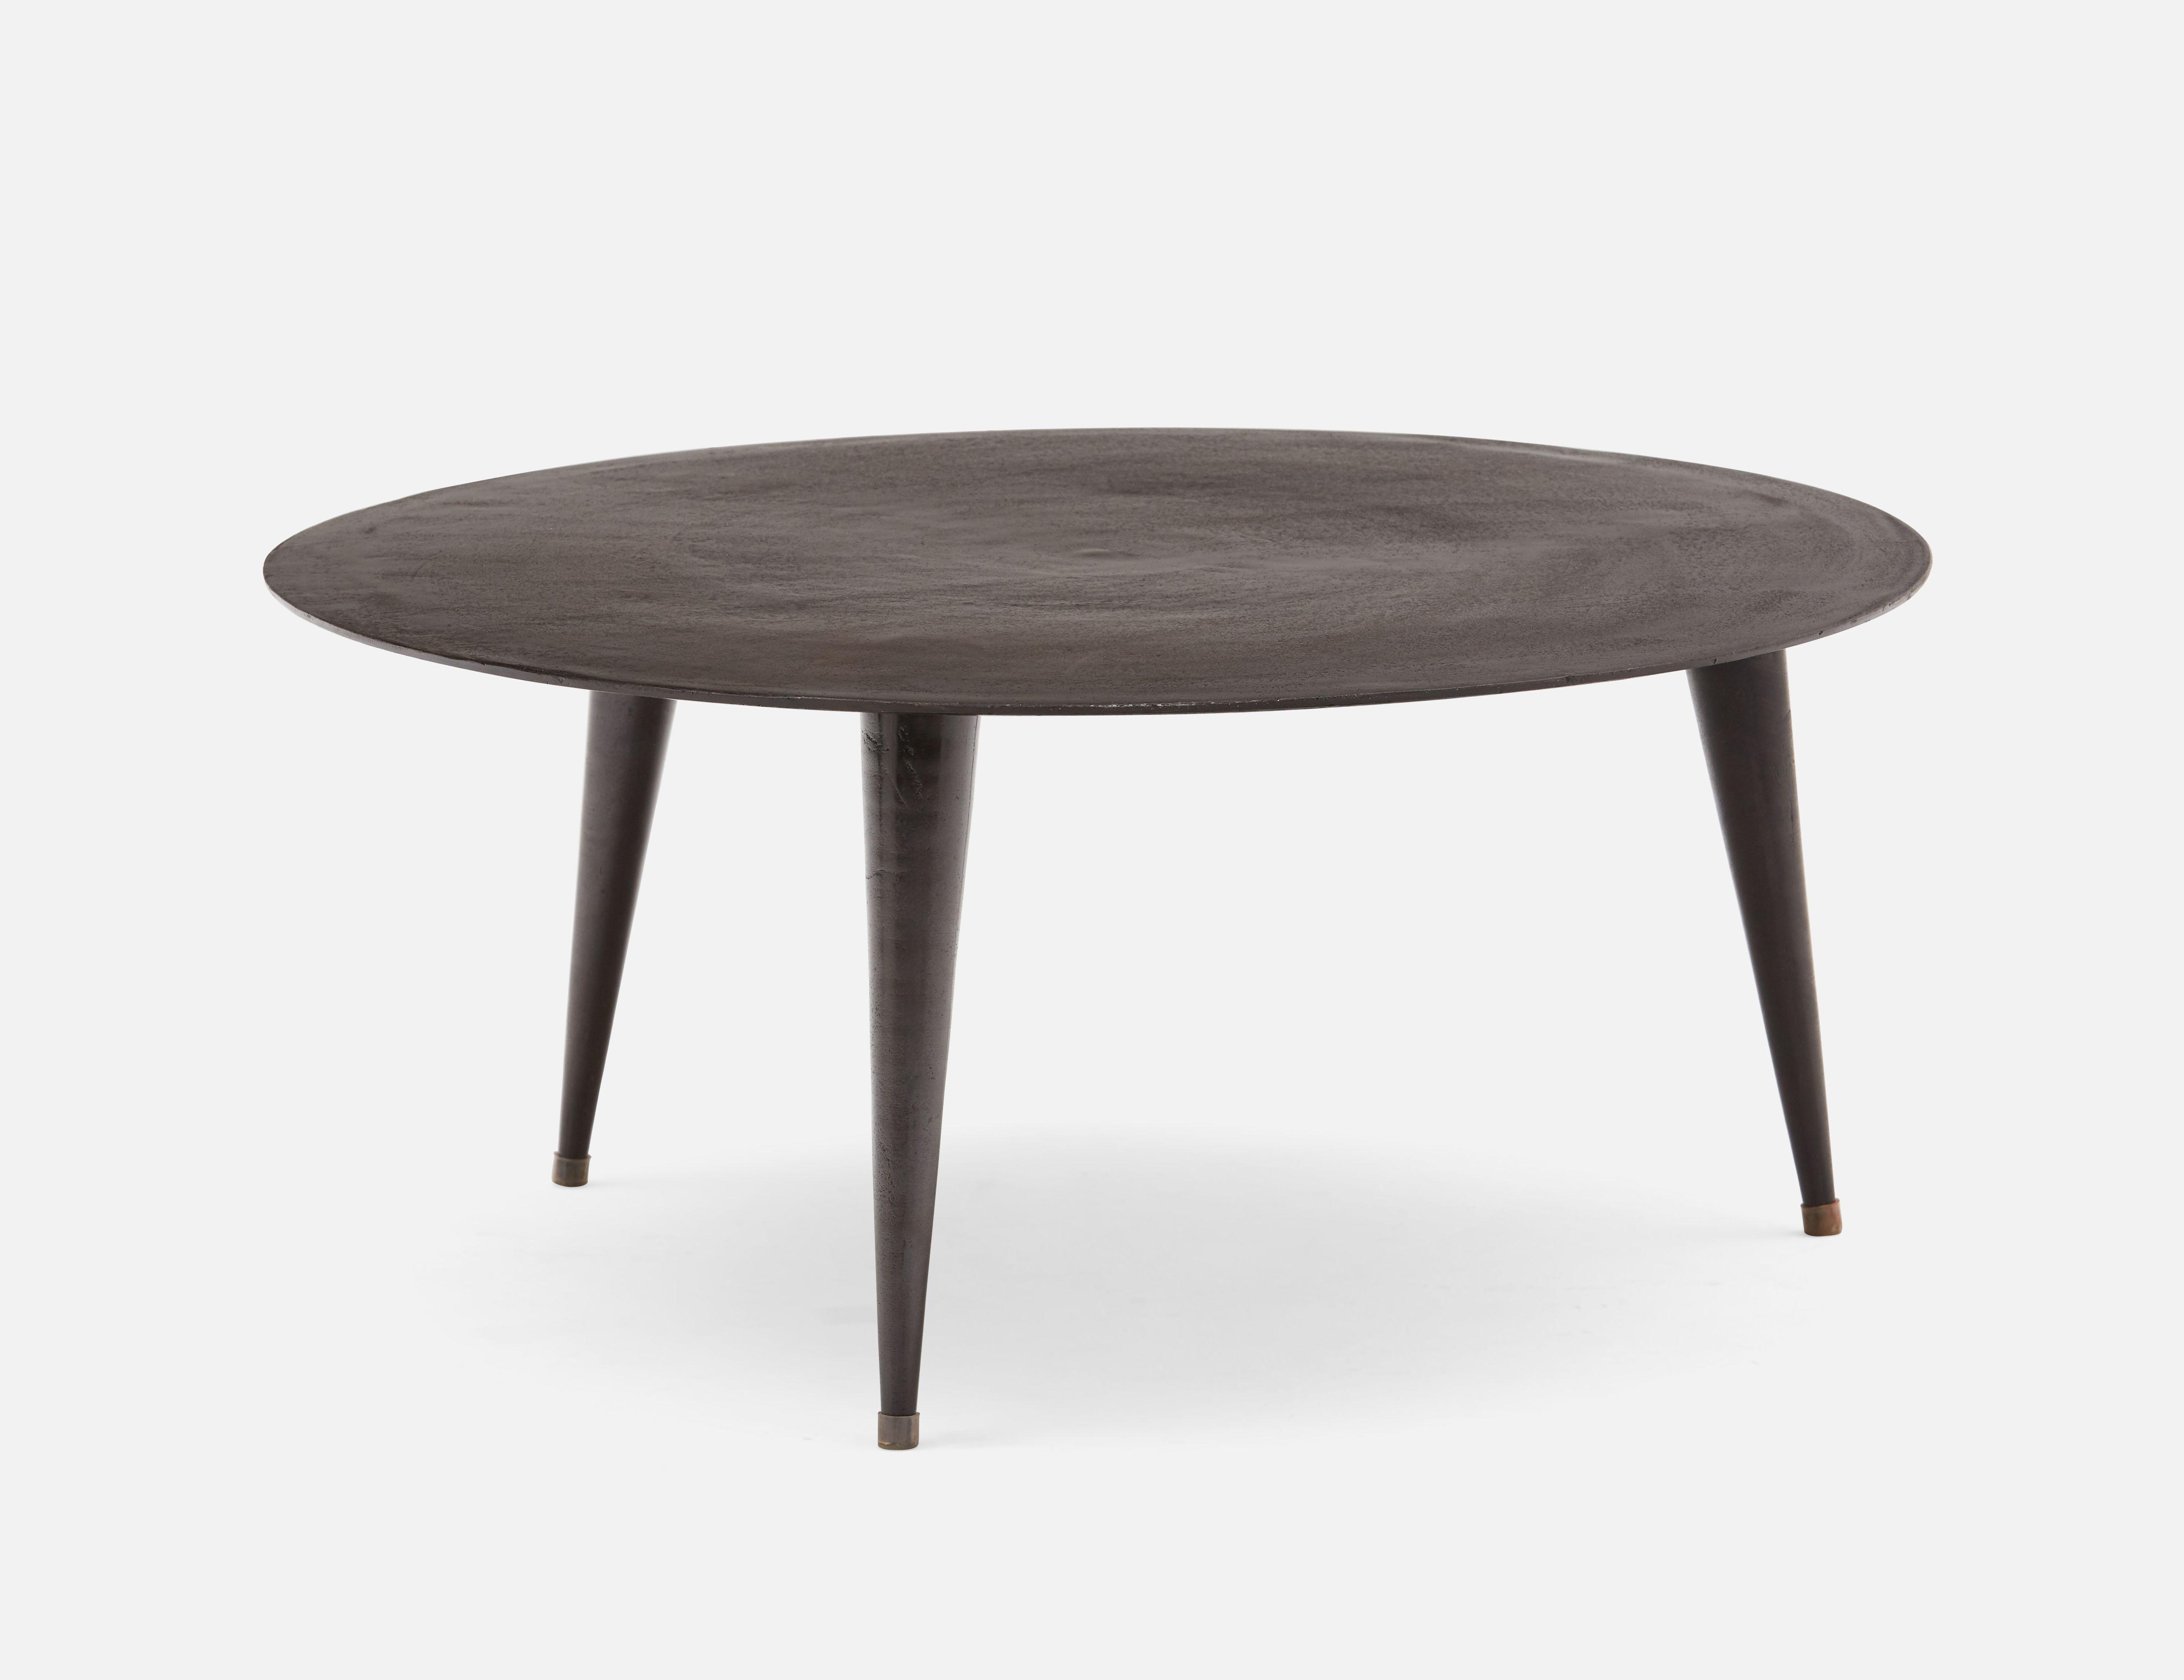 Brick Aluminum Coffee Table 90cm 36 Structube Jodie Coffee Table Aluminum Coffee Table Coffee Table Structube